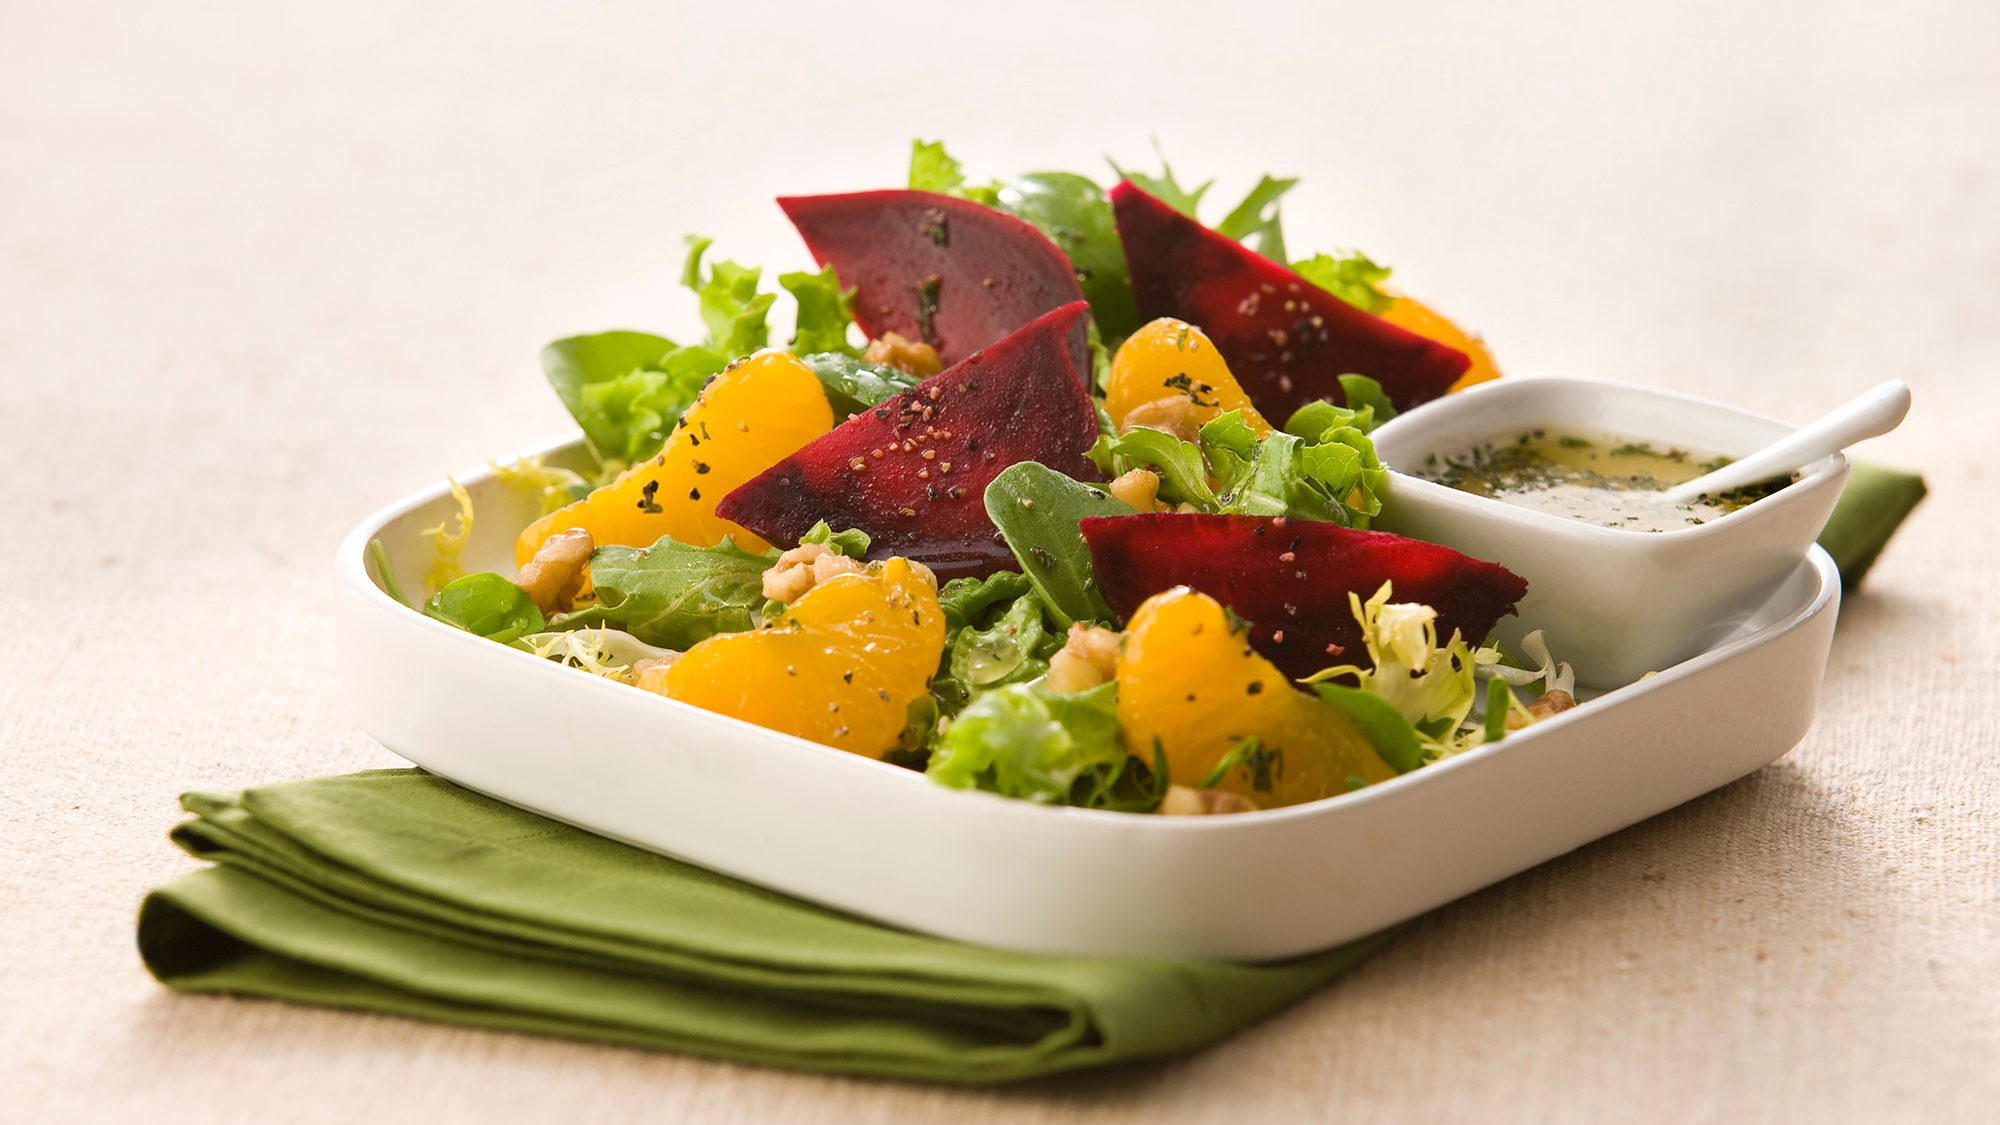 McCormick Gourmet Roasted Beets and Mandarin Orange Salad